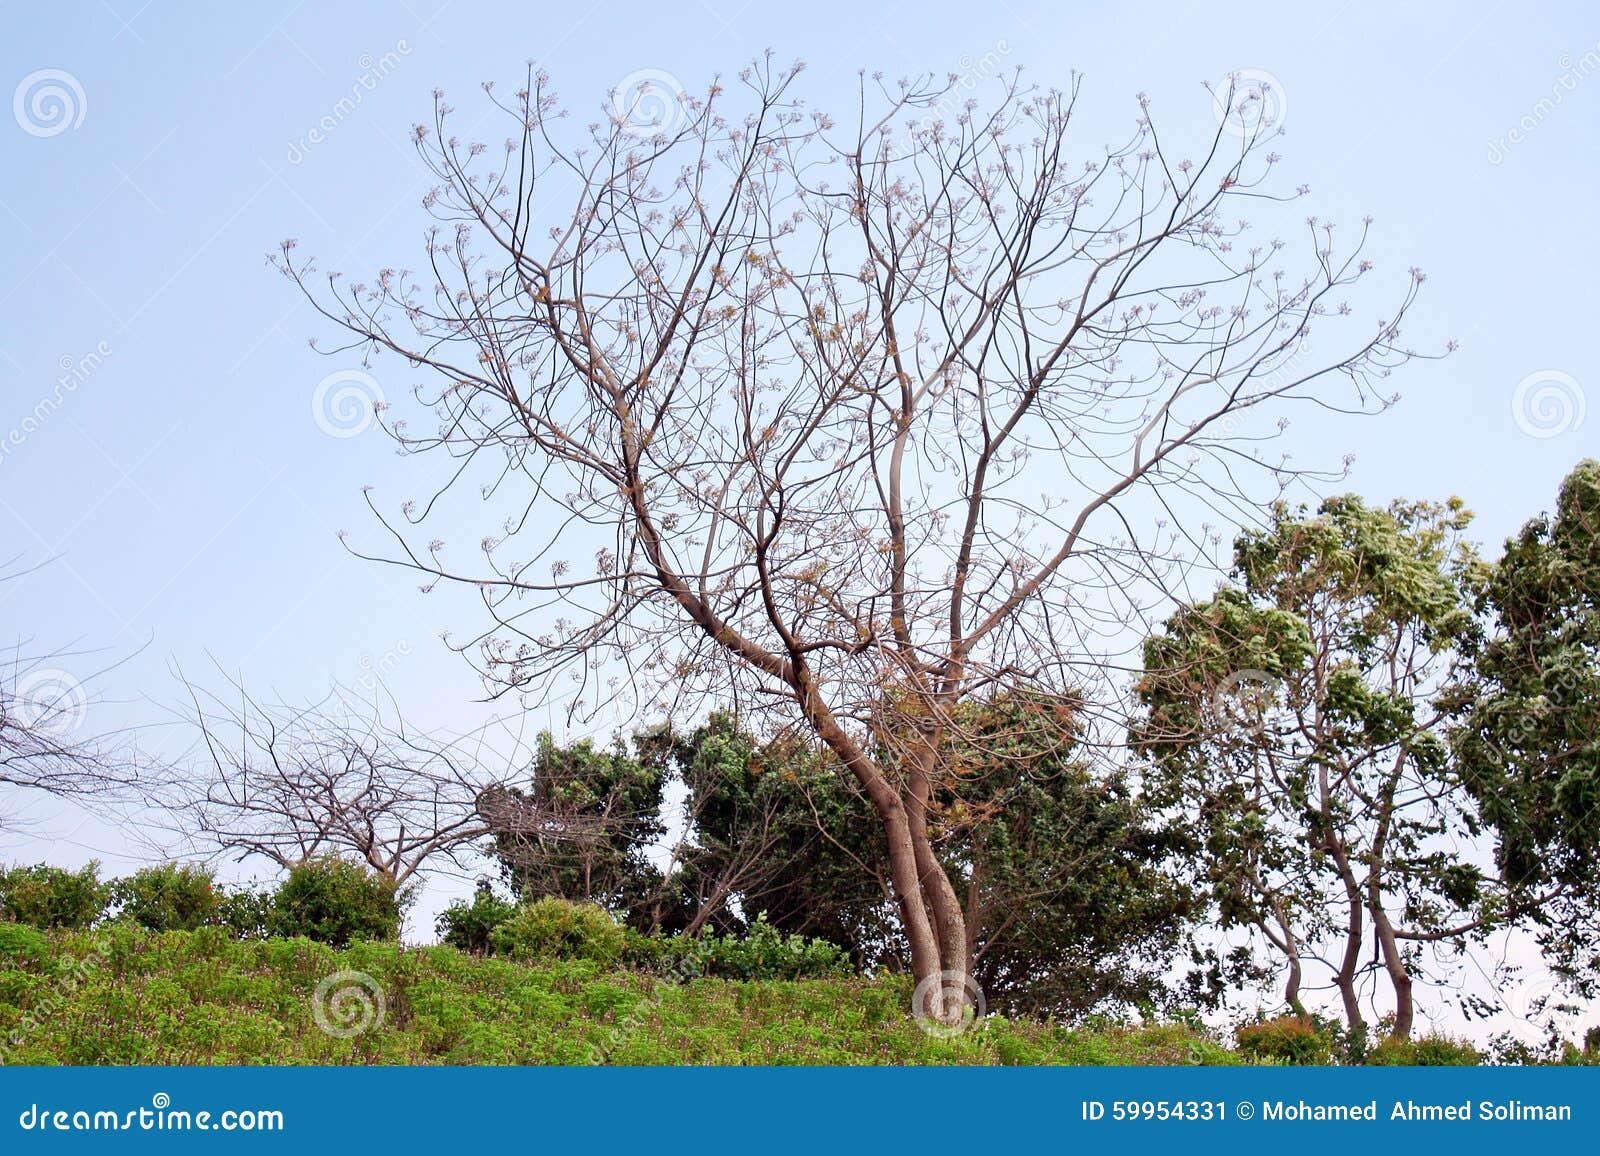 Beauty Of Nature Stock Photo Image 59954331